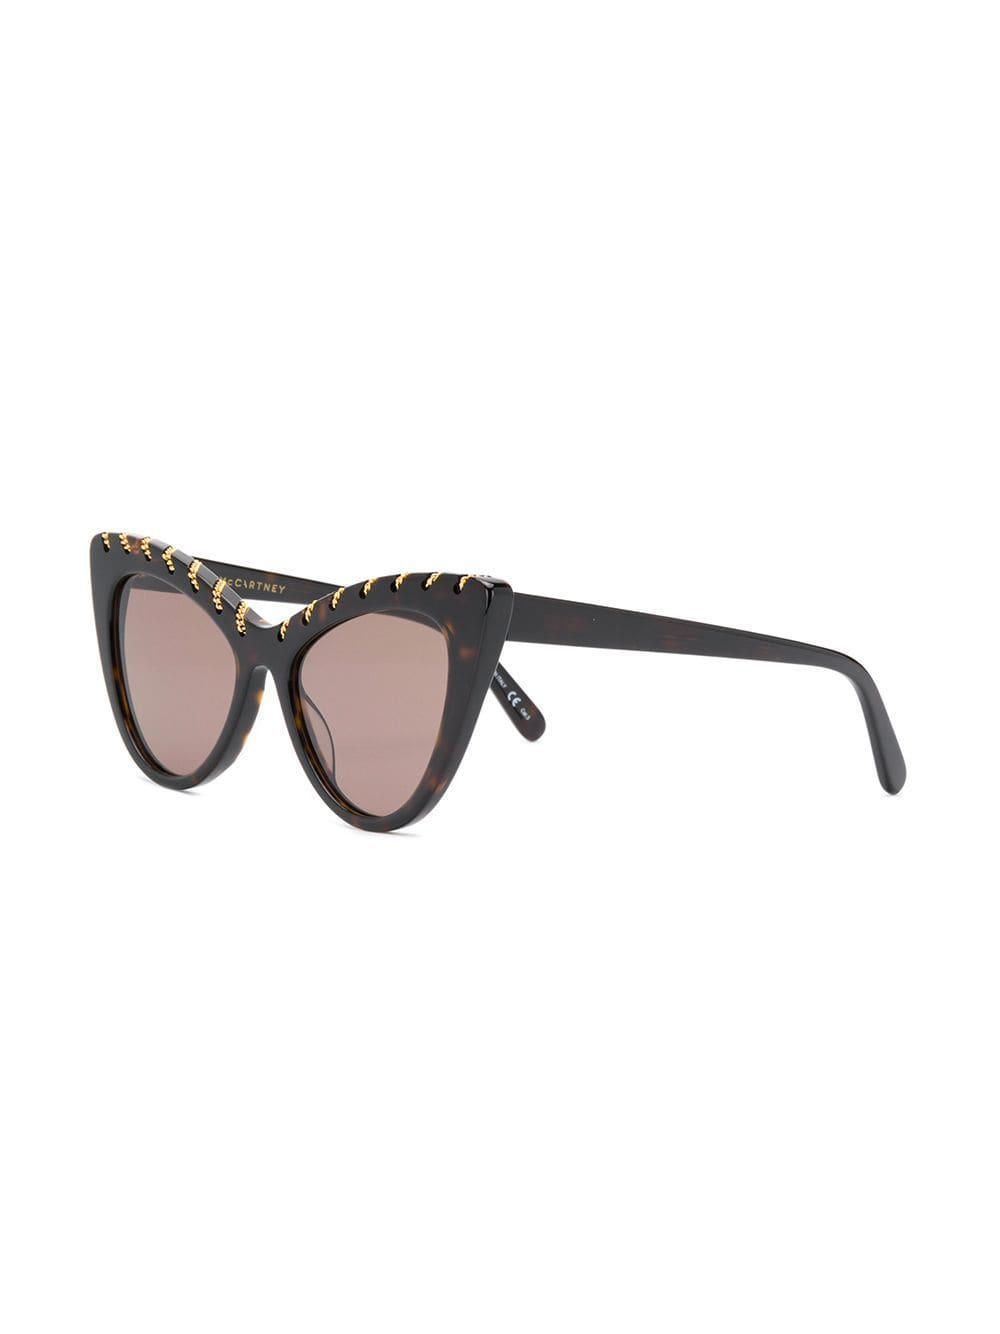 8d6a7a87df Stella McCartney - Brown Falabella Cat Eye Sunglasses - Lyst. View  fullscreen